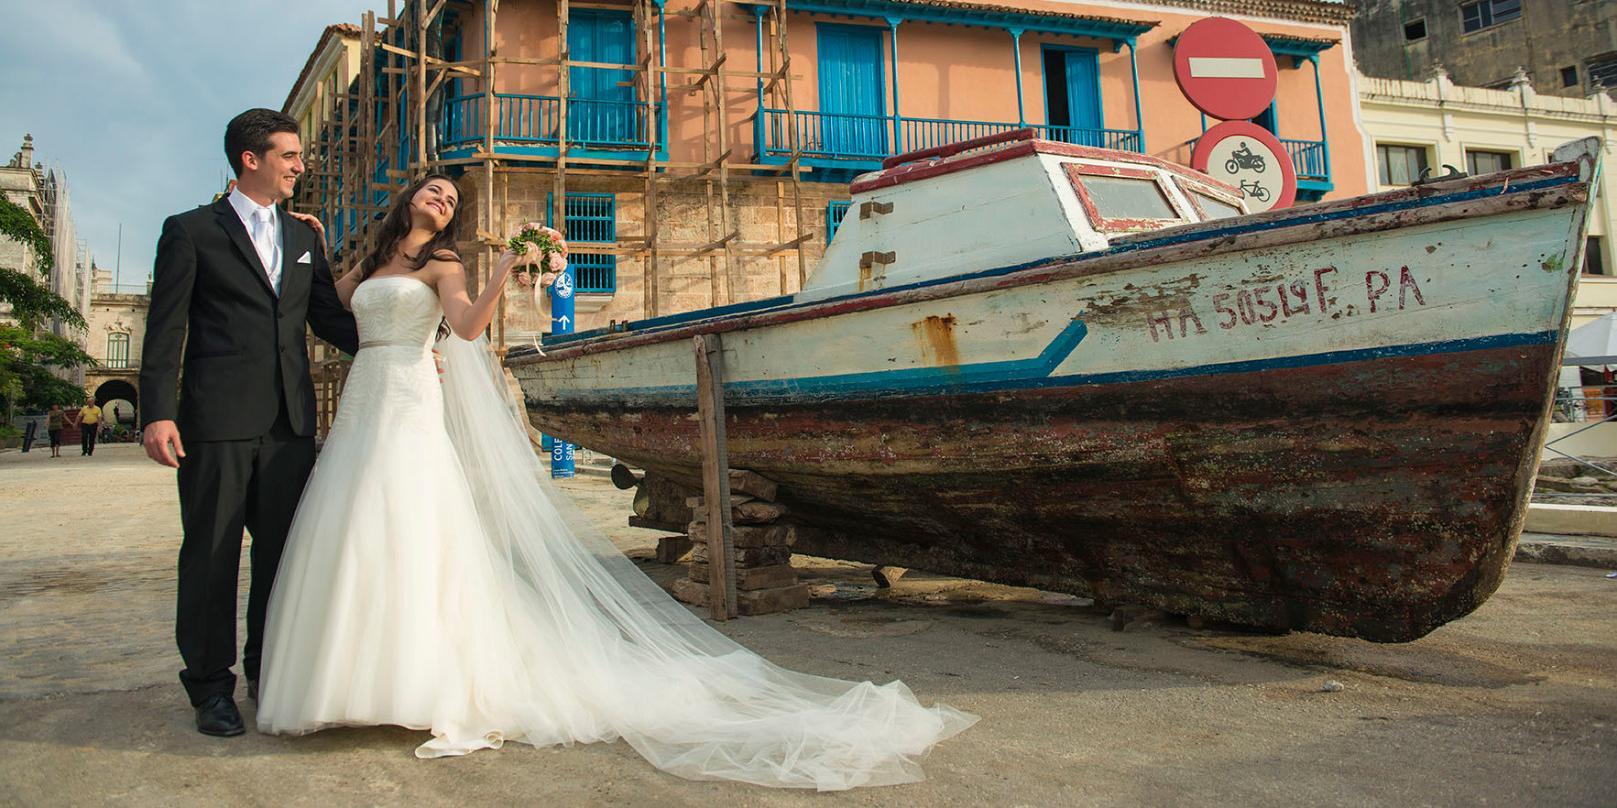 bodas-sin-clasificar-sin-tema-cuba-15531.jpg